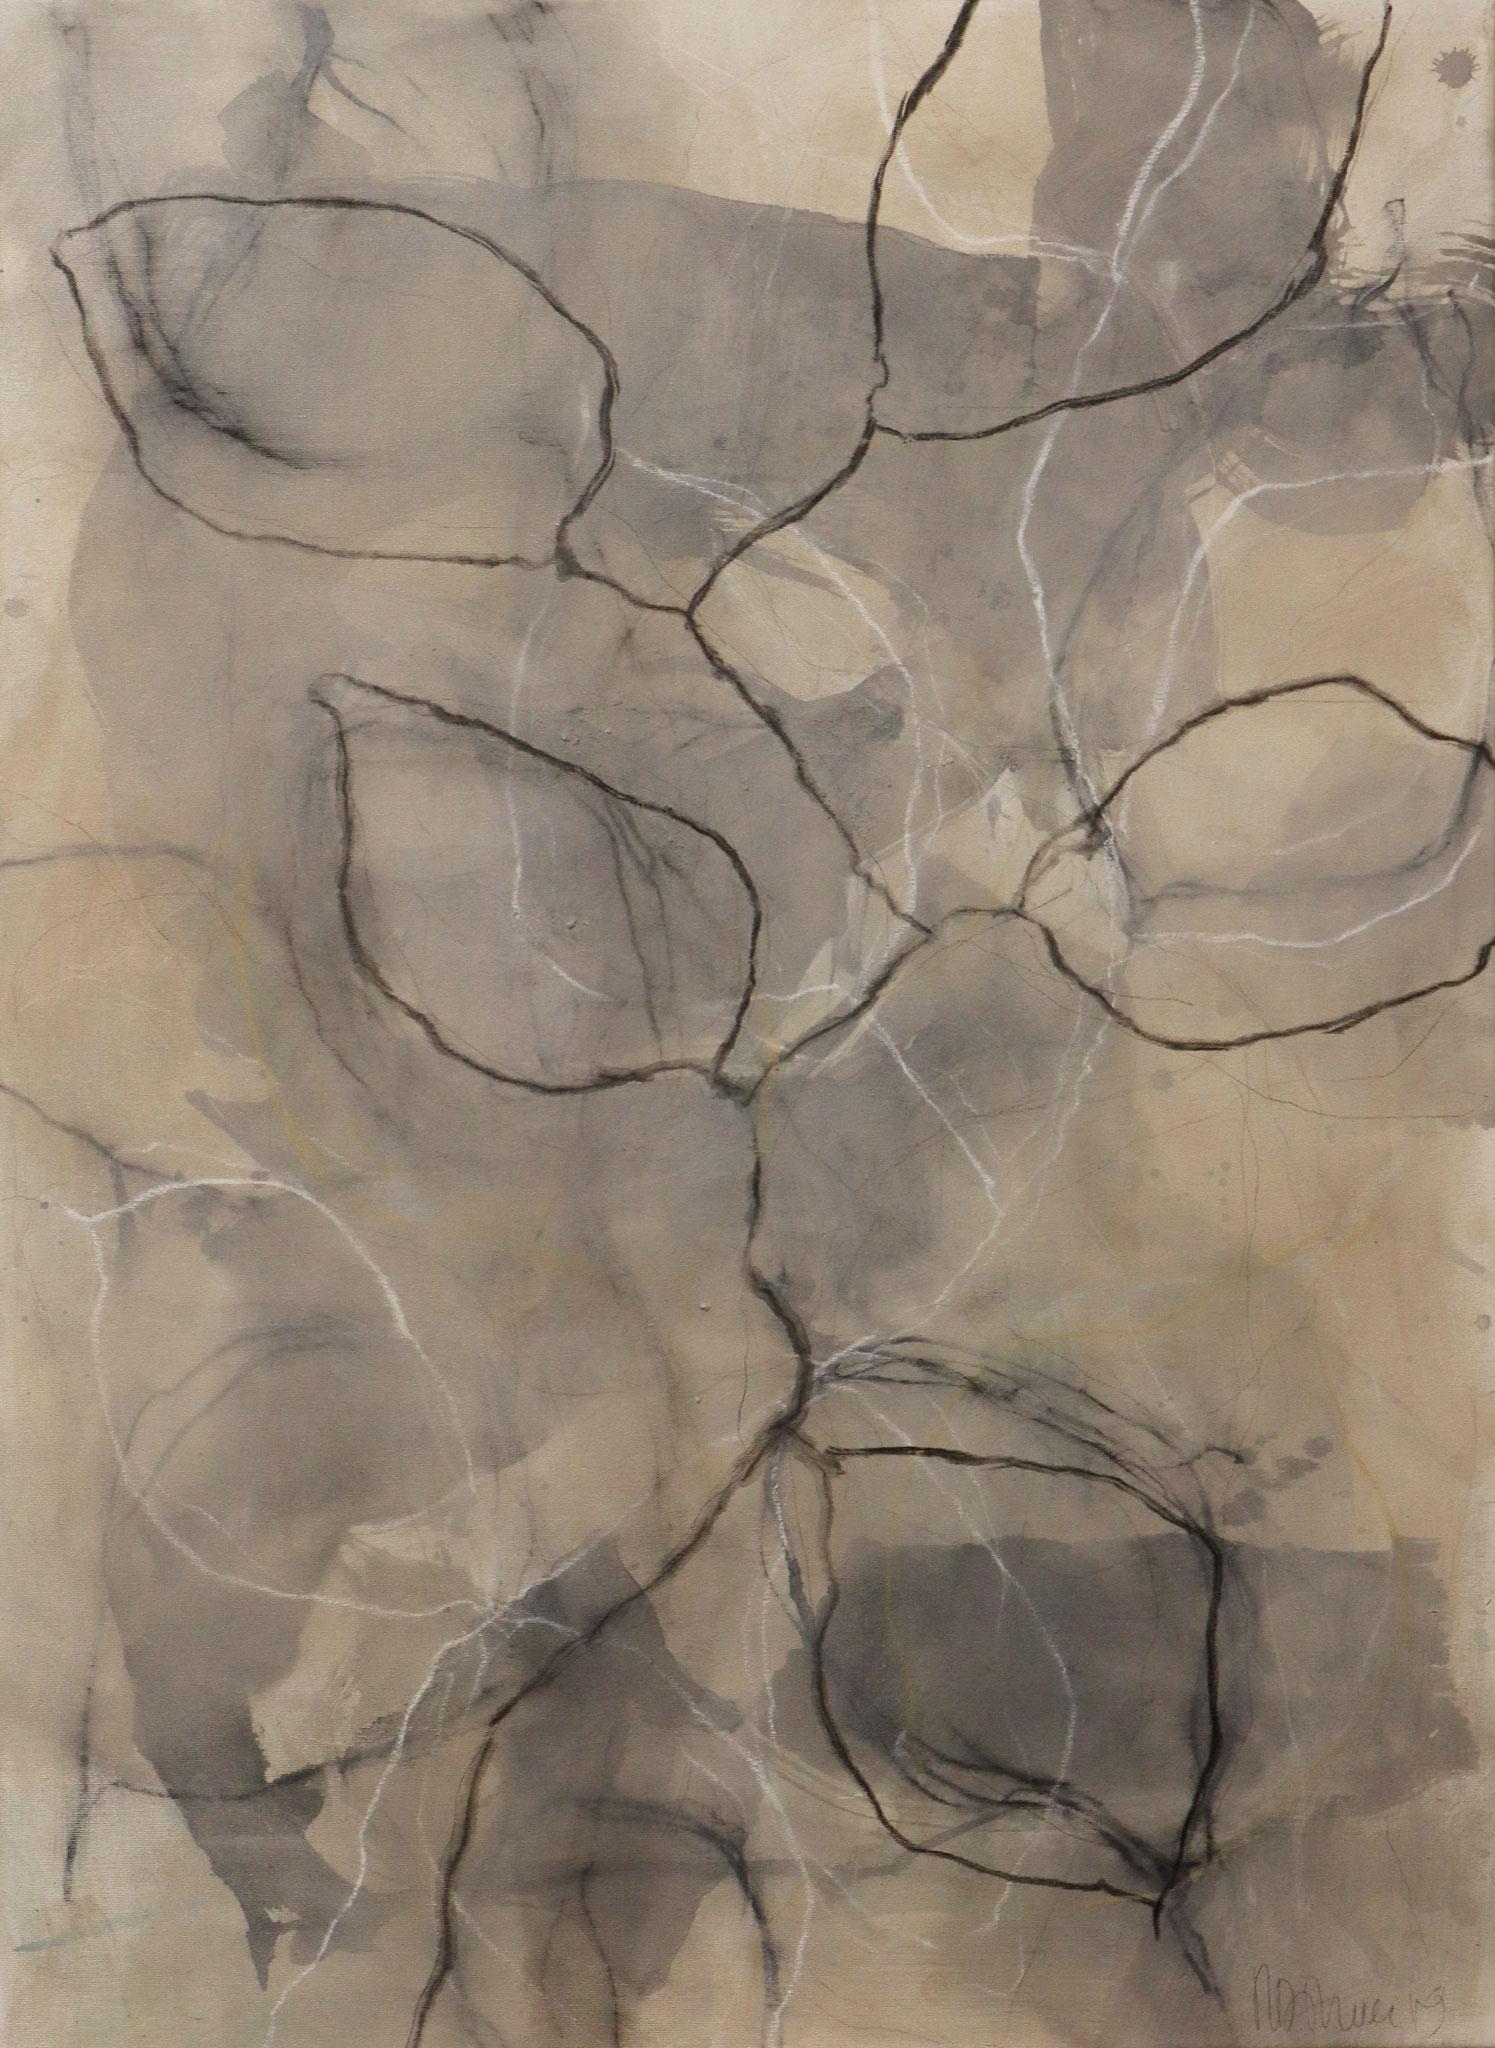 Serie 'Traces' 2019 - Mischtechnik auf Leinwand / mixed media on canvas - 80 x 100 cm